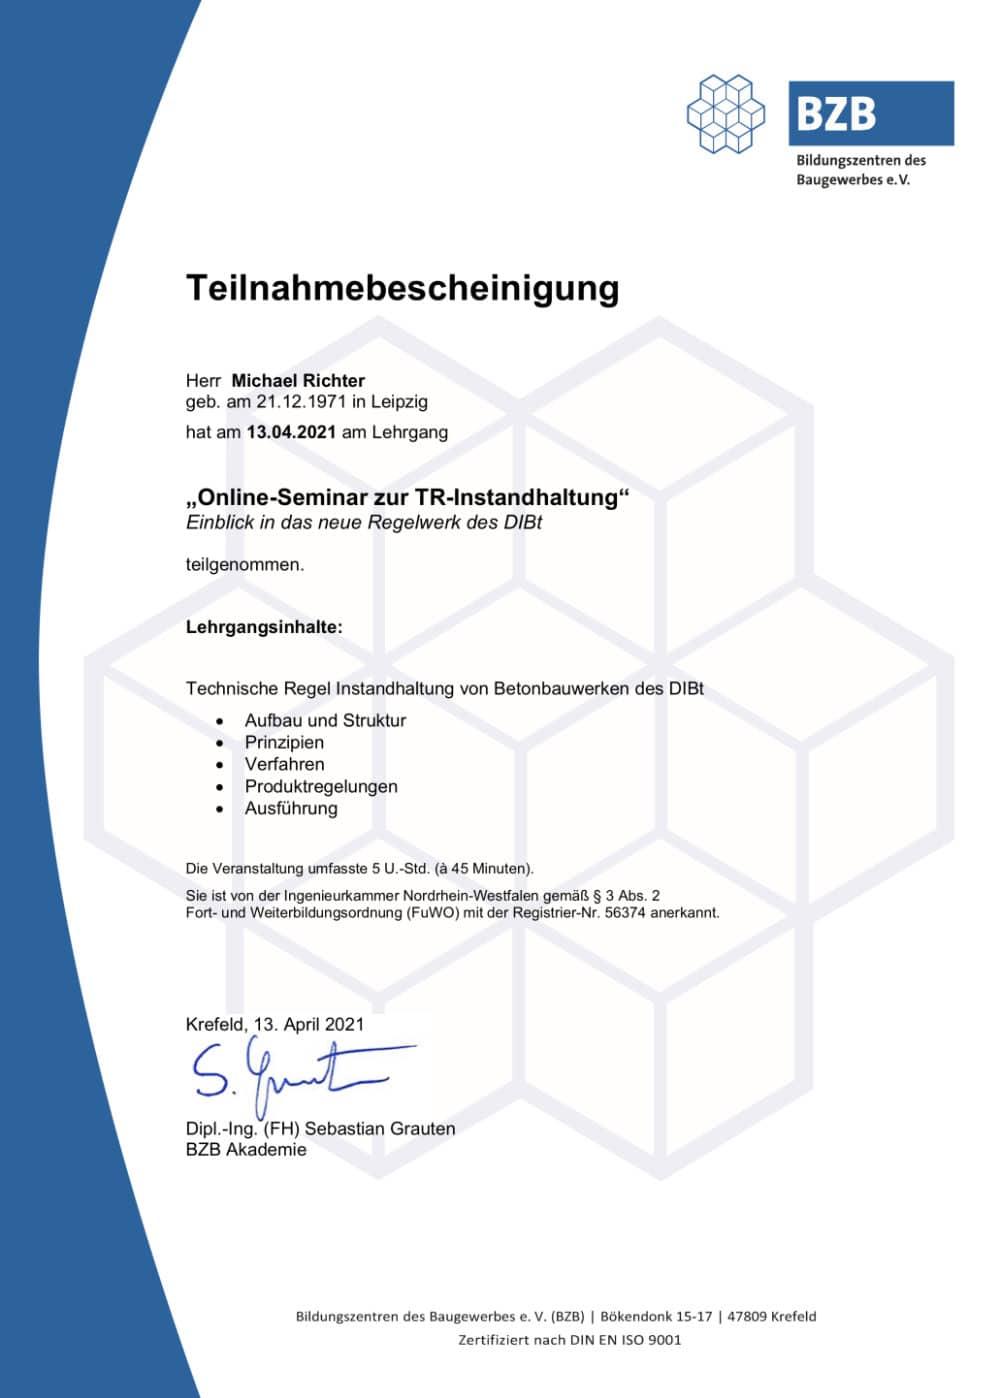 Zertifikat-TR-Instandhaltung-Betonbauwerke-DIBt